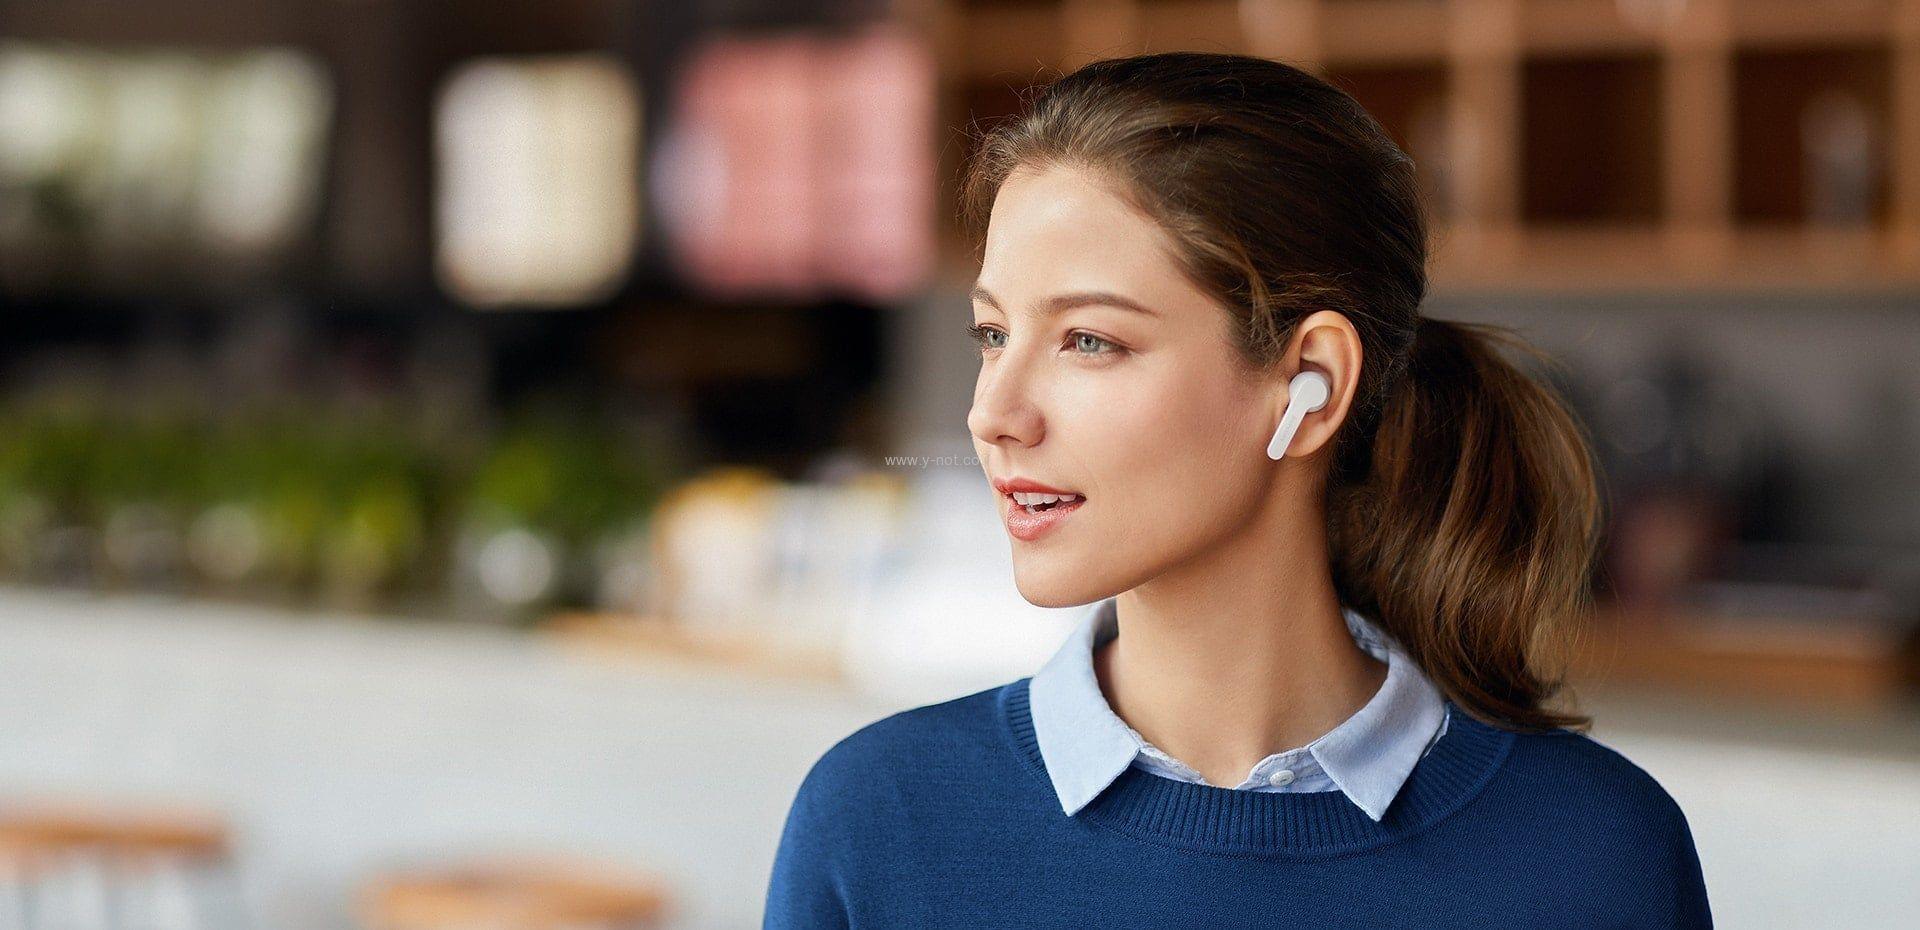 Best Affordable Wireless Earphones